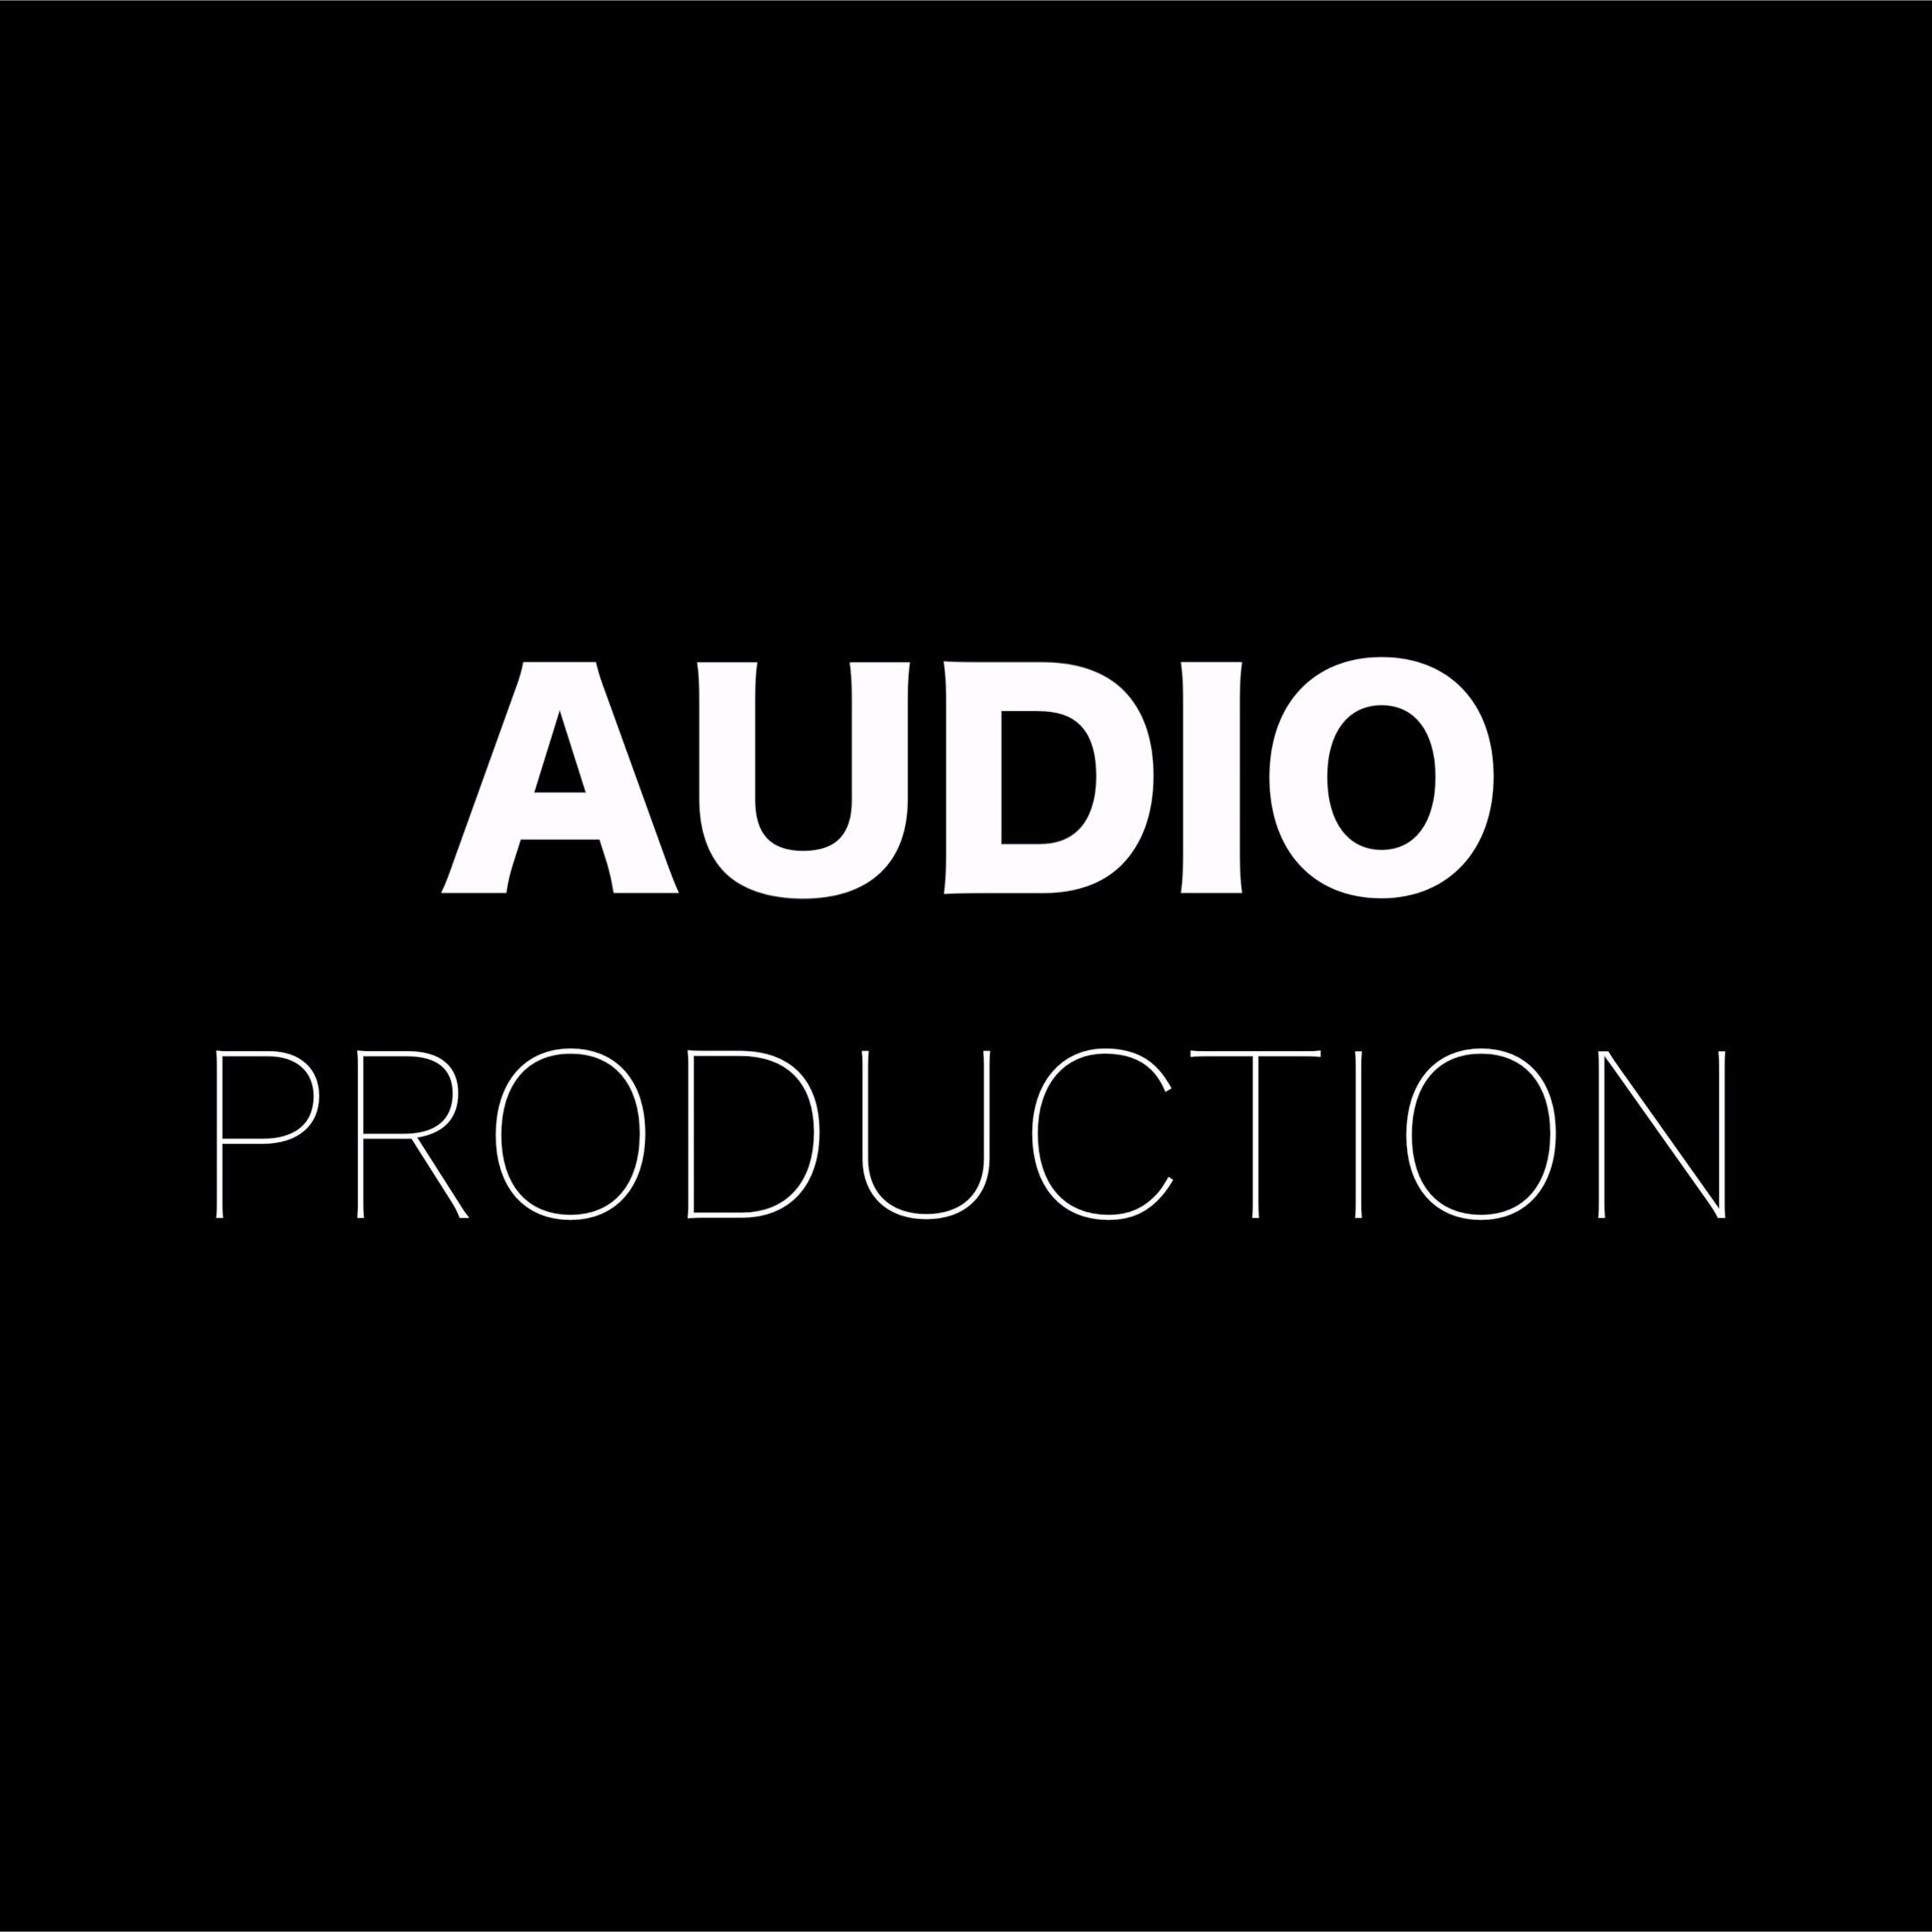 Audio Production Square.jpg